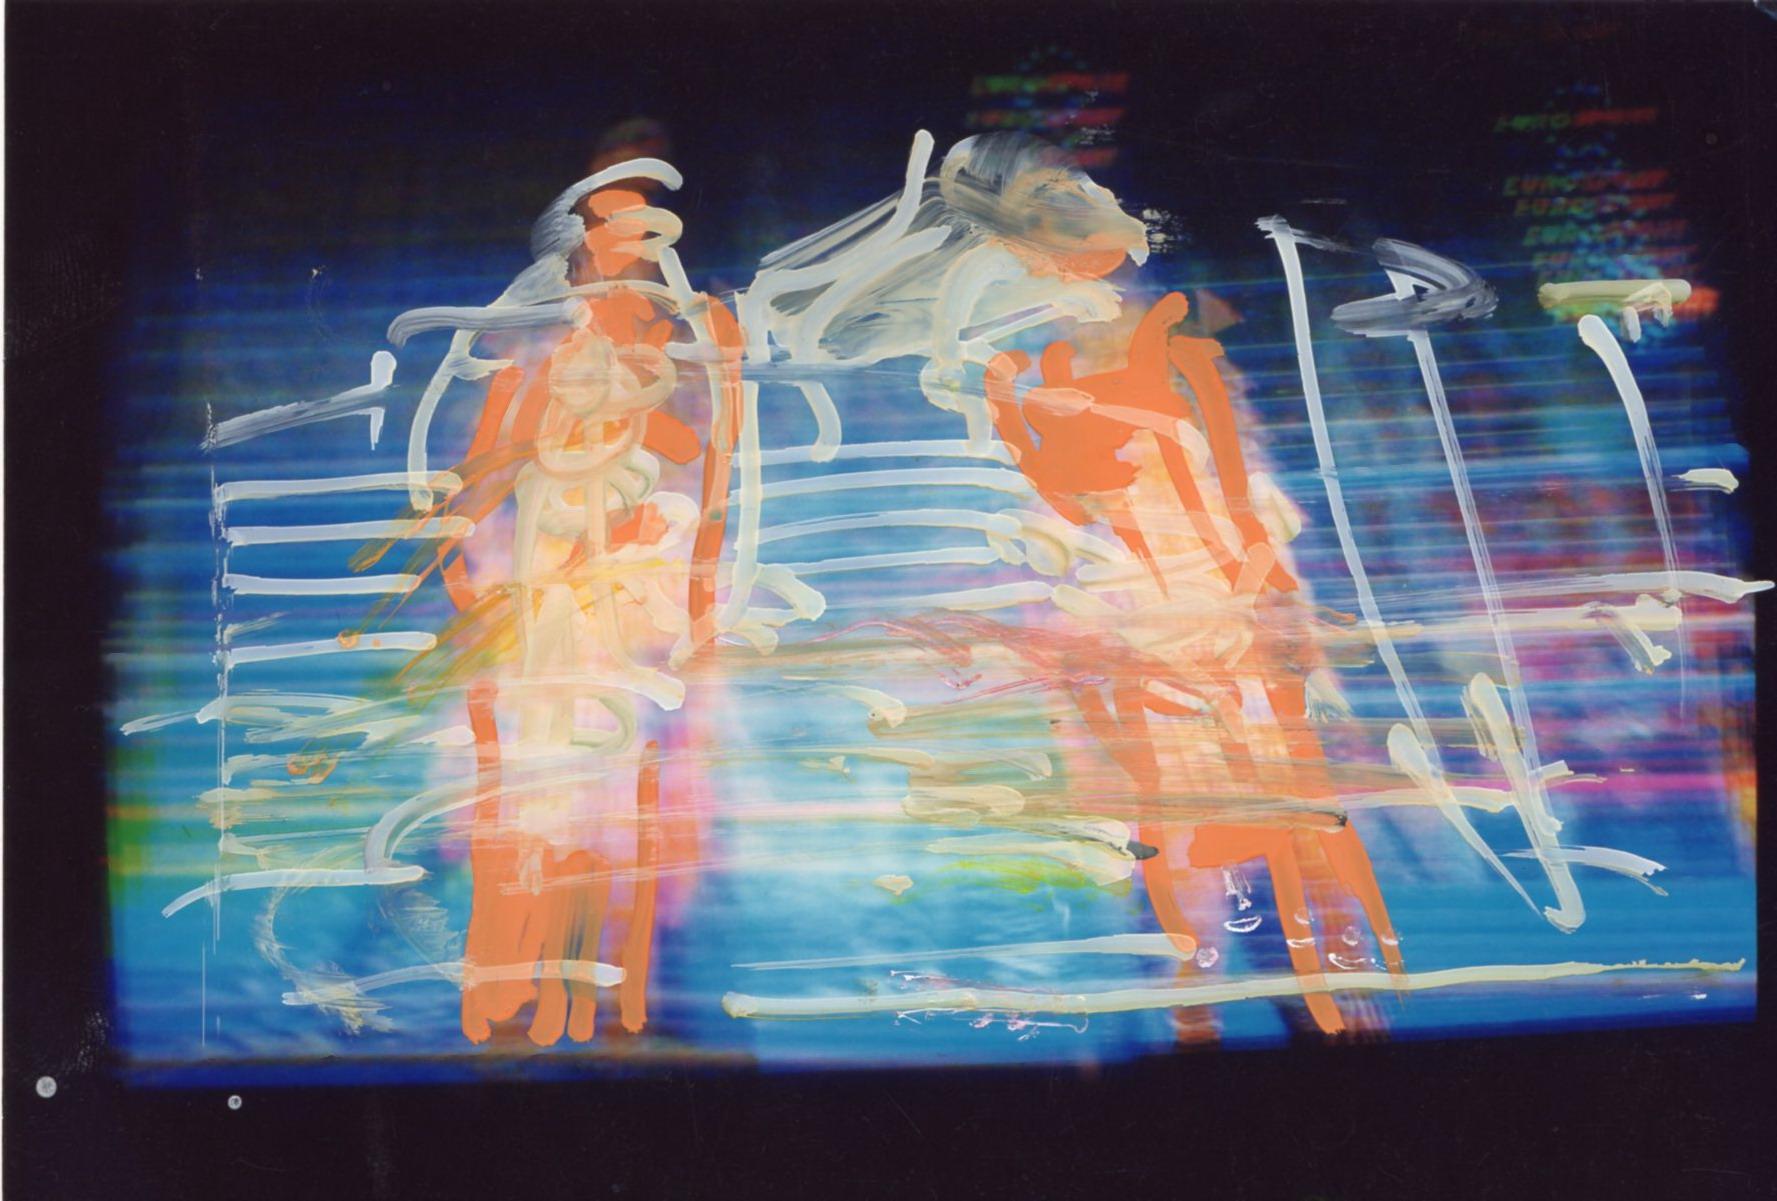 Mario Schifano, Untitled 2112, 1990/1995, mixed media on photograph, 10×15 cm